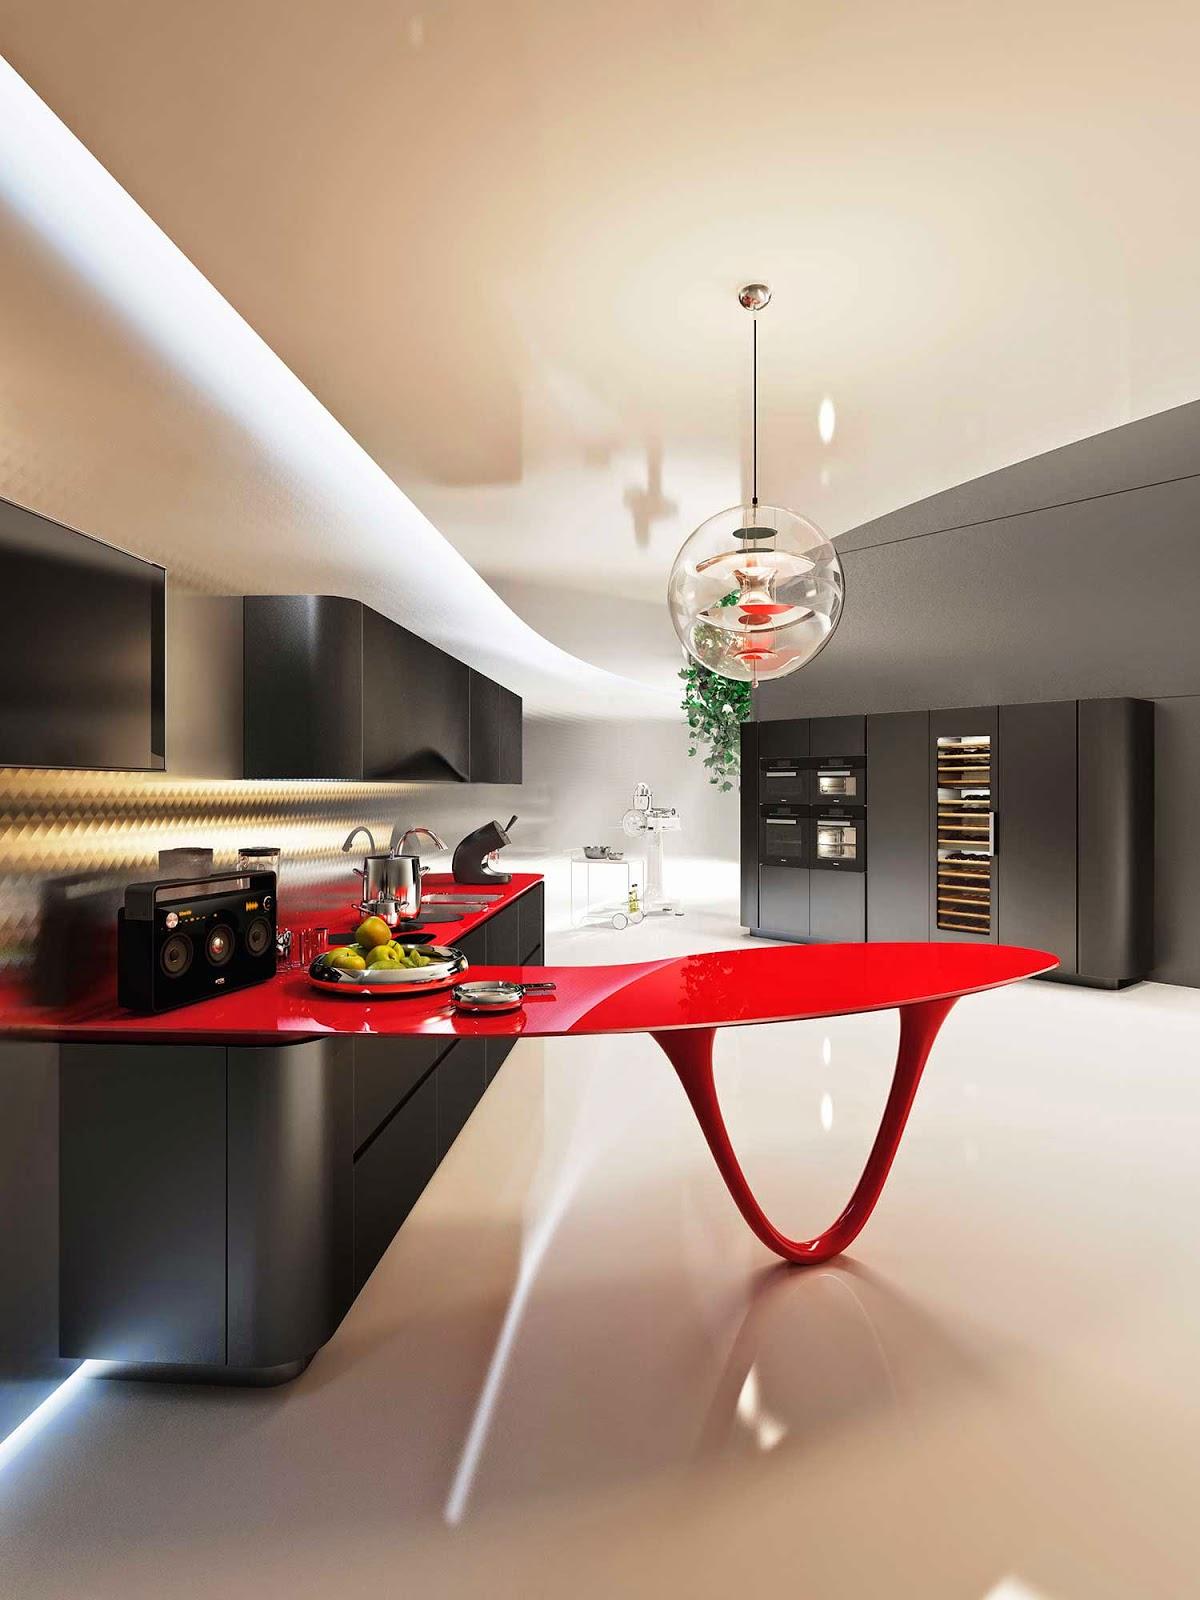 Muebles Para Baño Ferrari:Marzua: Espectaculares muebles basados en Ferrari para la cocina